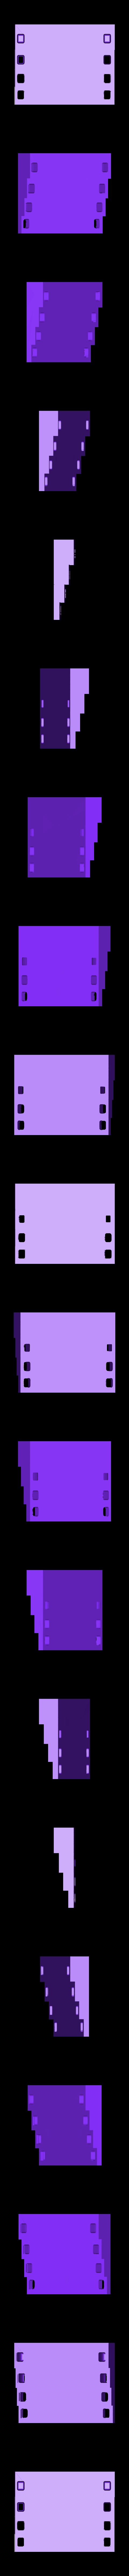 petit escalier barriére.stl Download STL file playmobil studio • 3D print design, catf3d